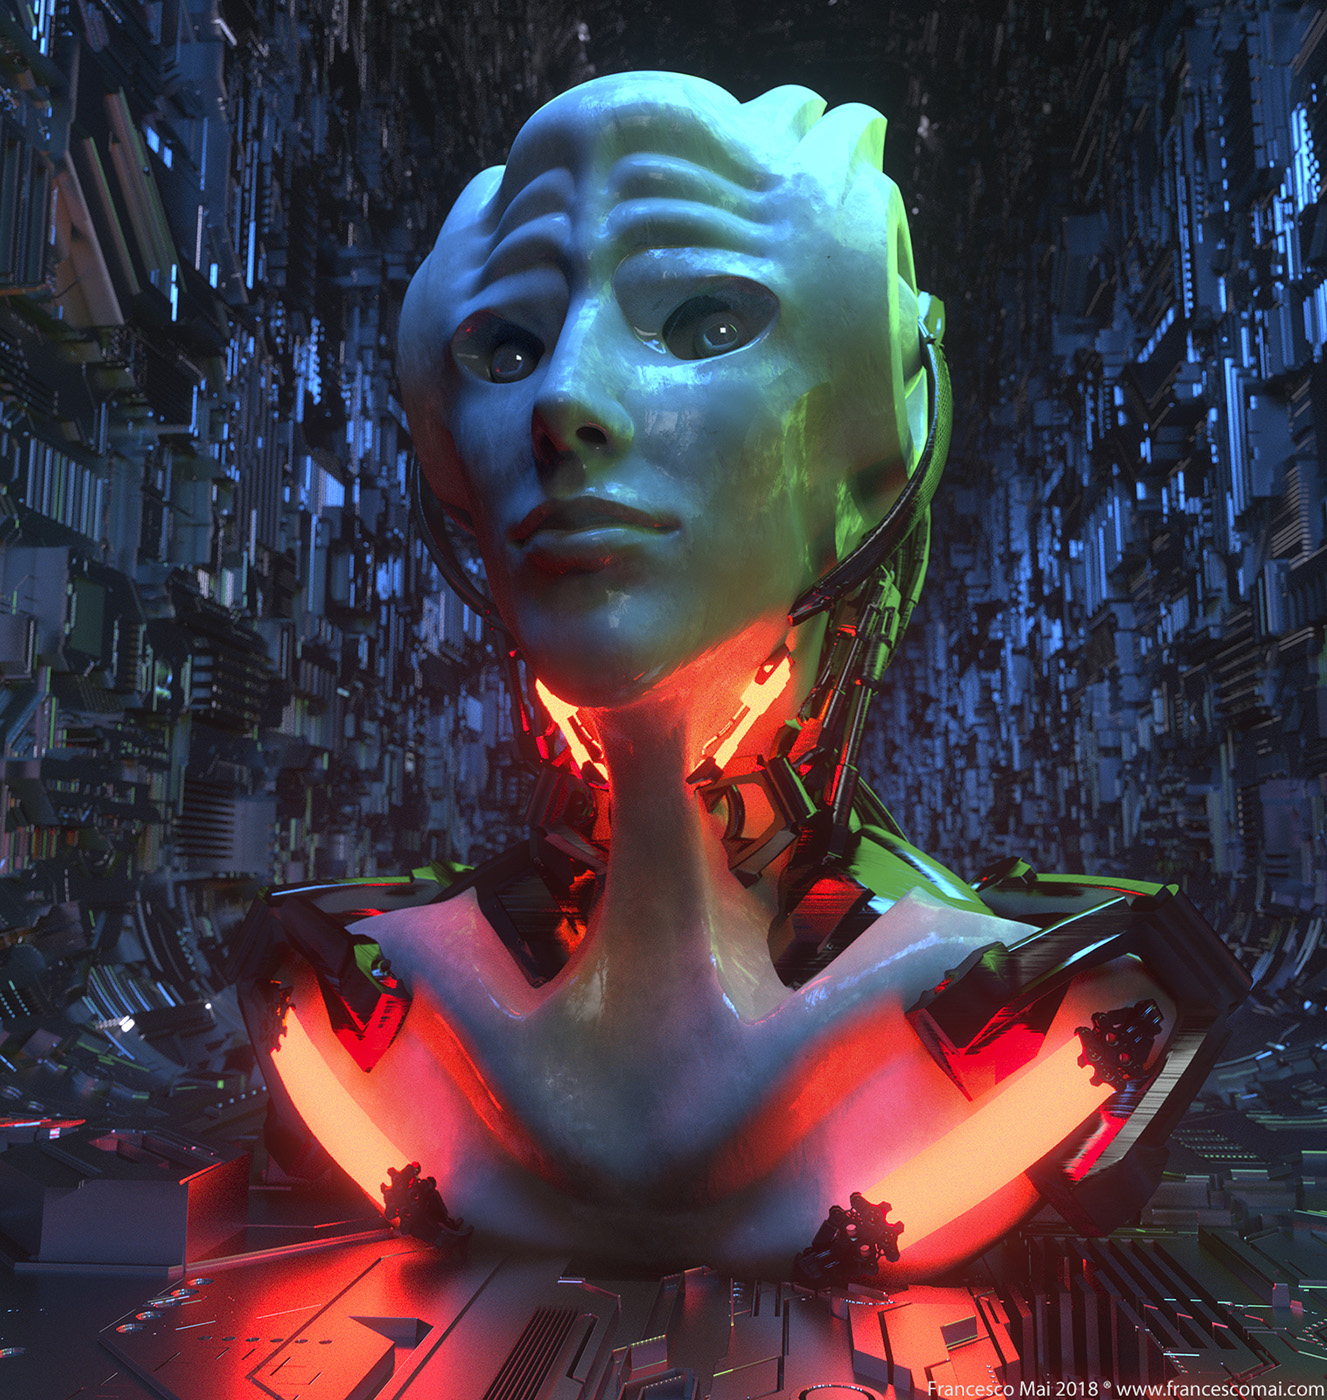 Testa Femminile cyber queen mat bianco occhigreeble tunnel variation ok RED.jpg